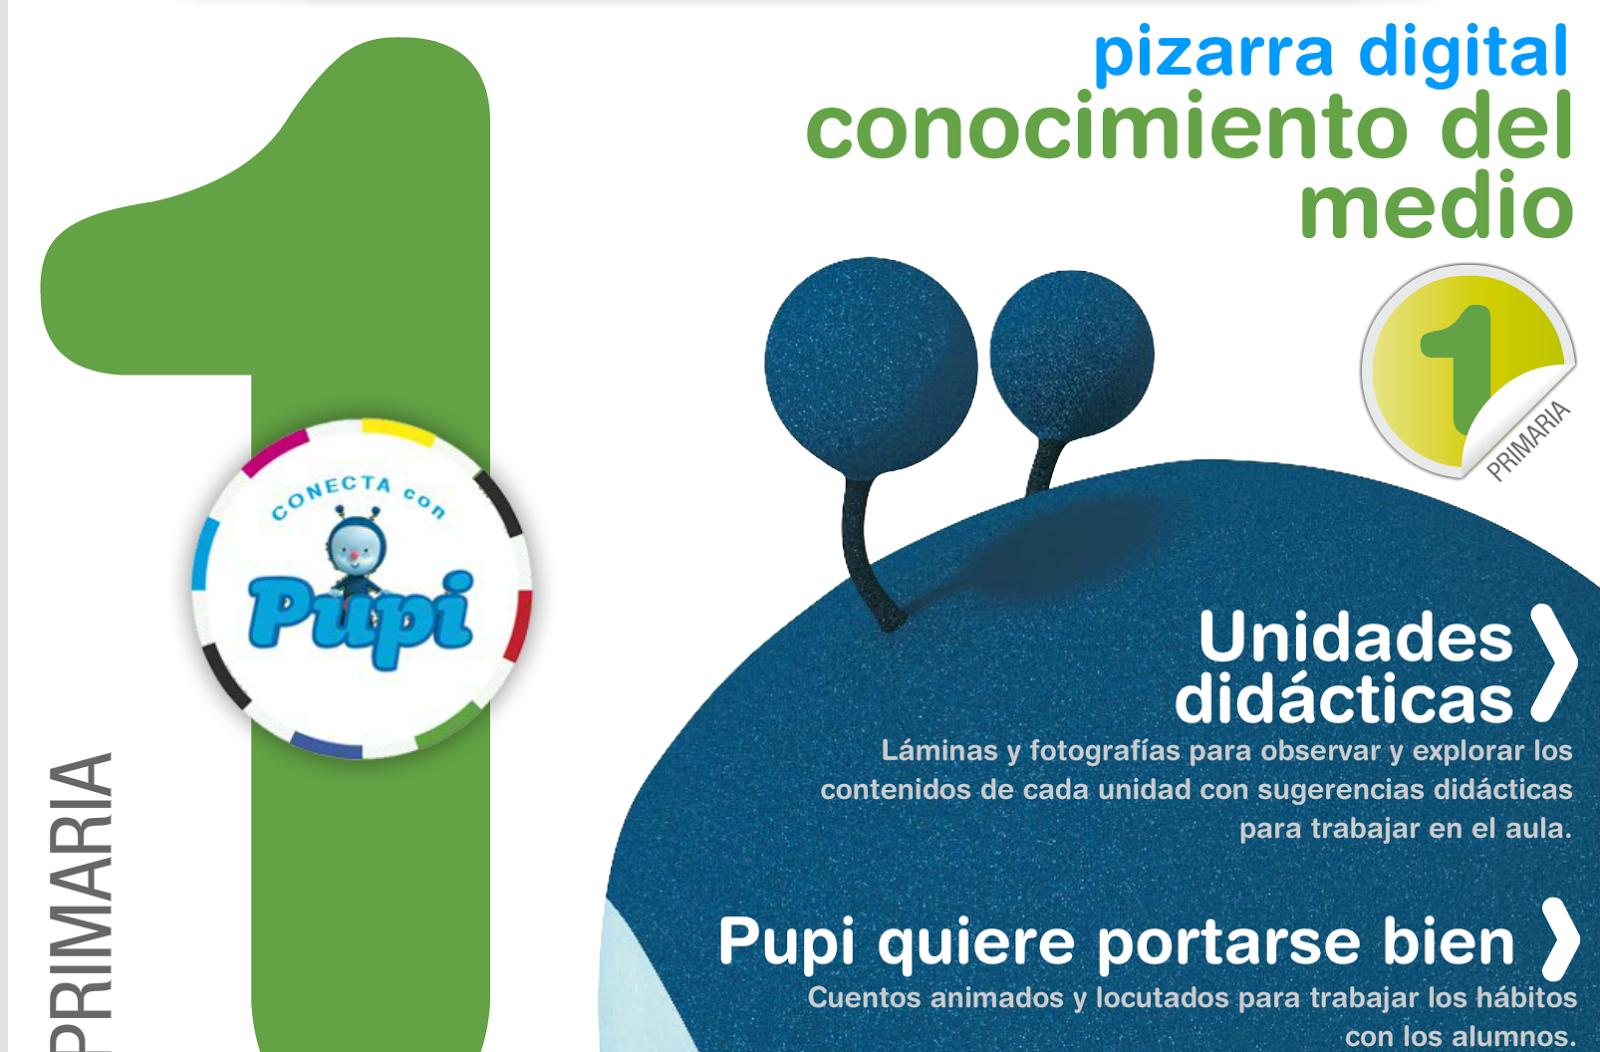 http://primerodecarlos.com/primerodecarlos.blogspot.com/pizarradigitalprimero/lengua1-pizarradigital/Lengua.swf